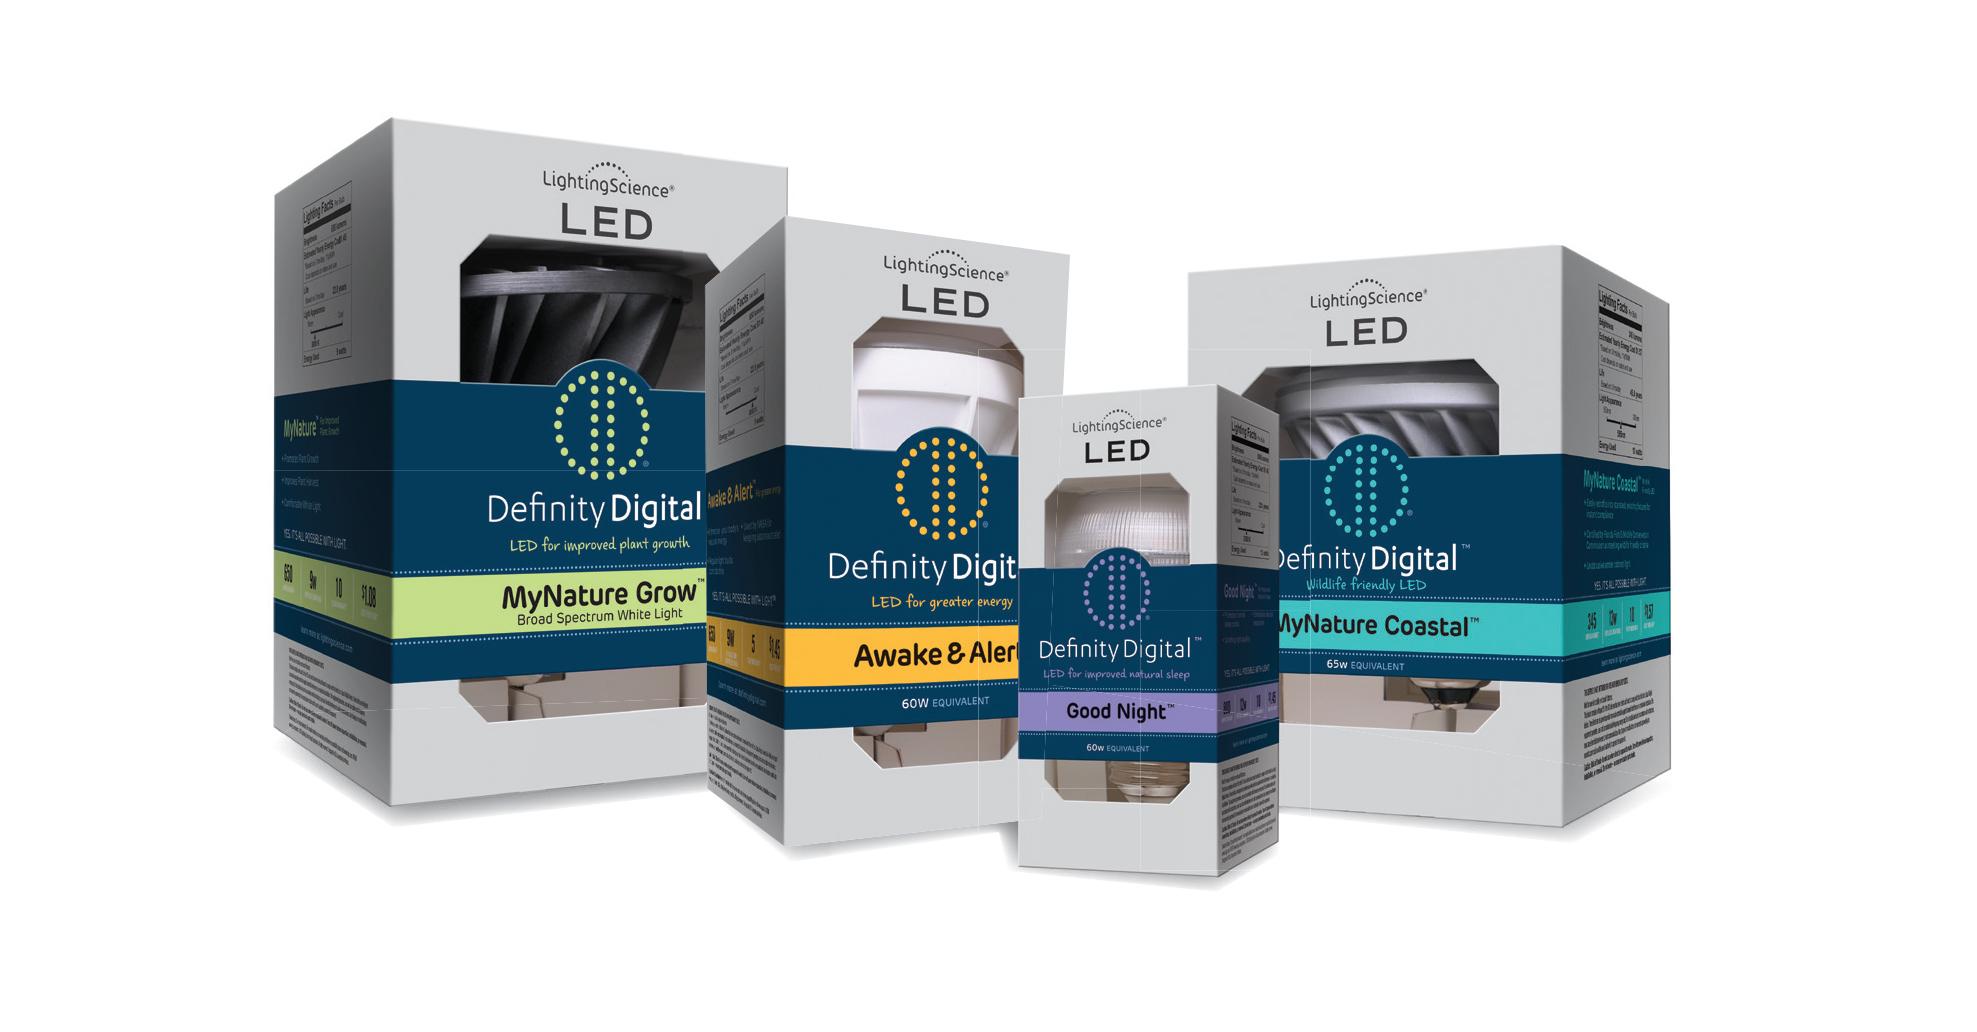 New Definity Digital Led Light Bulbs